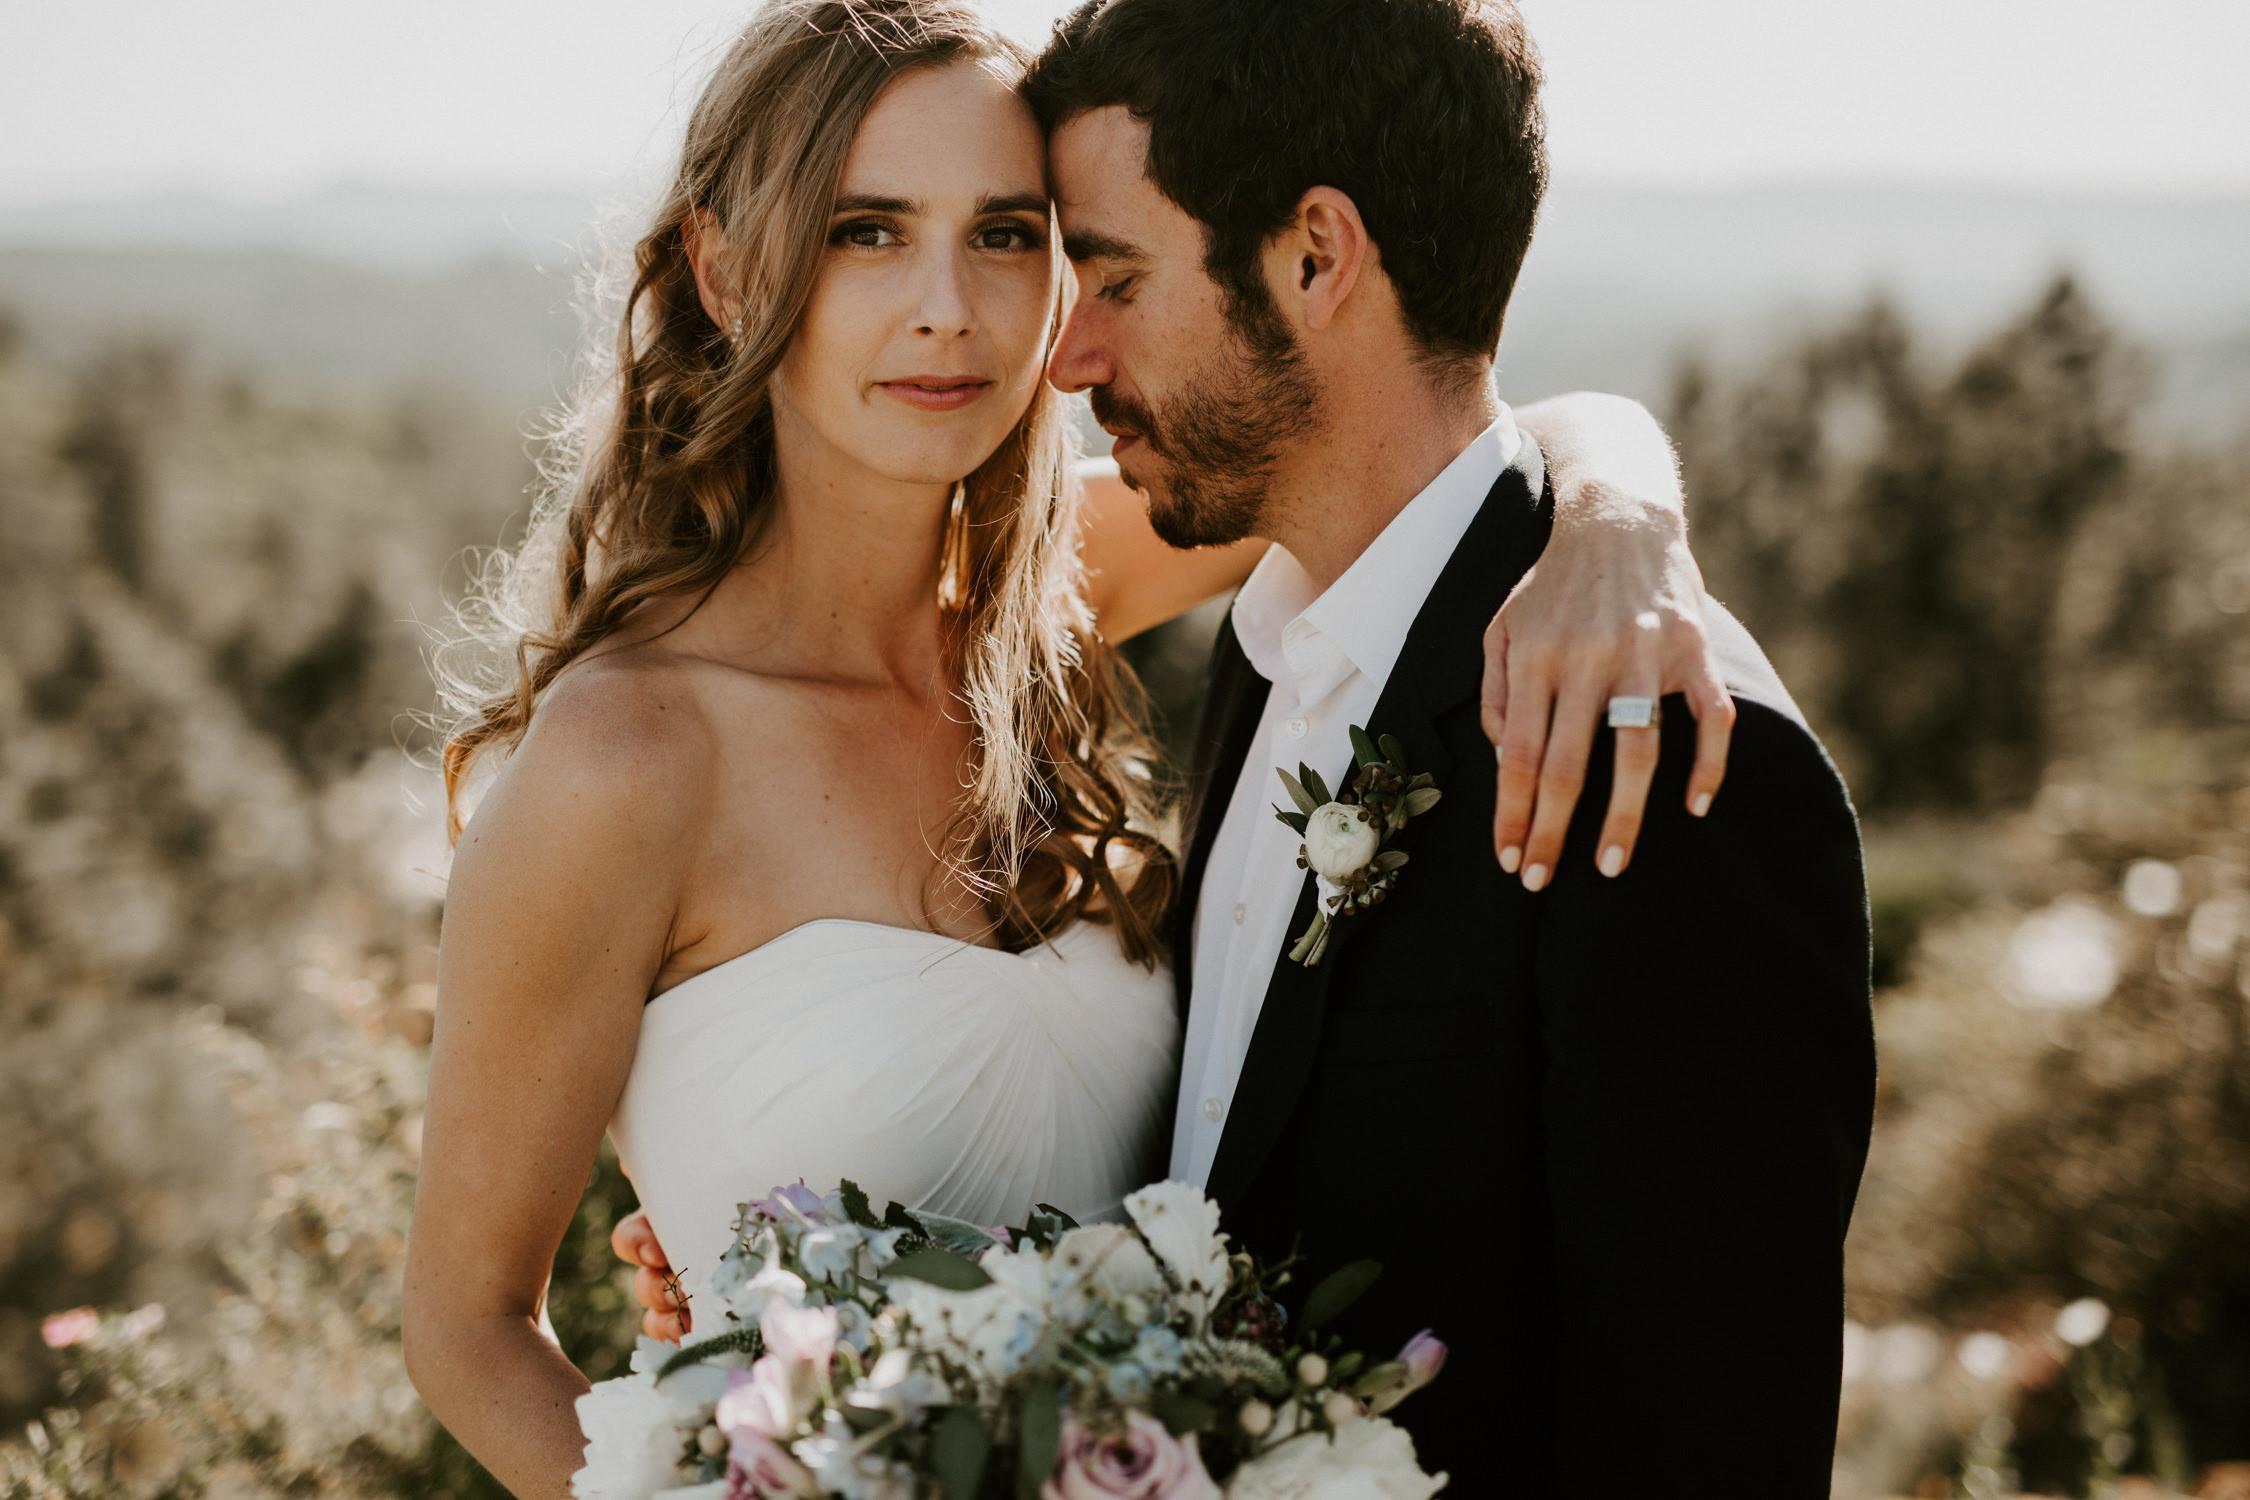 couple-wedding-northern-california_0105.jpg